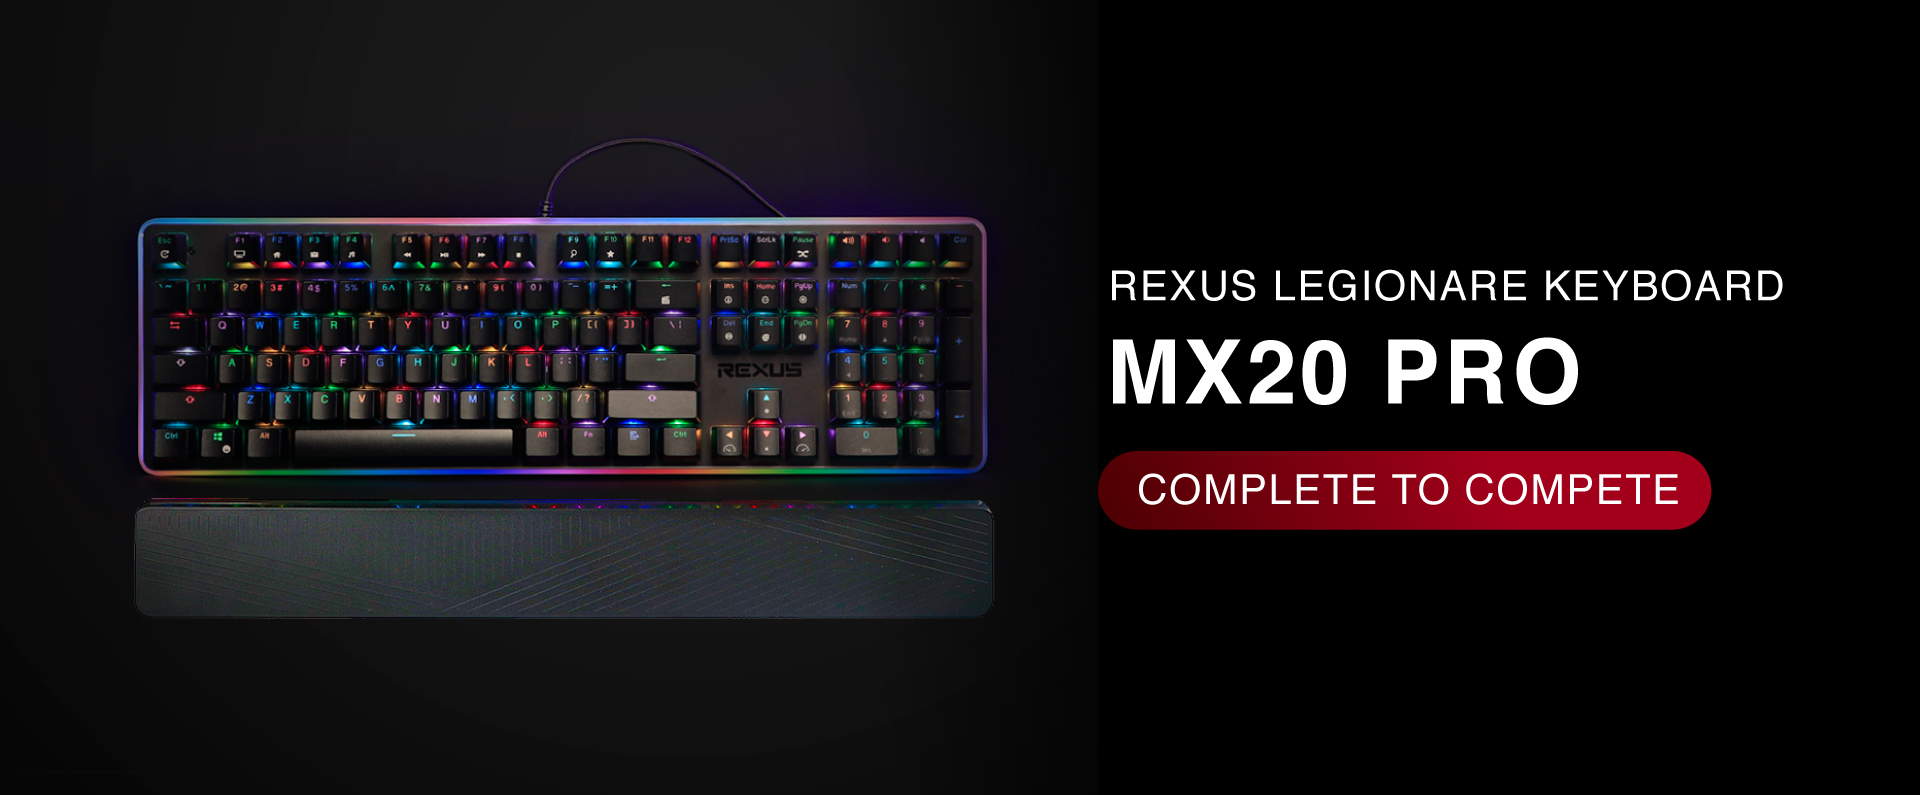 MX20 keyboard Rexus Legionare MX20 banner page